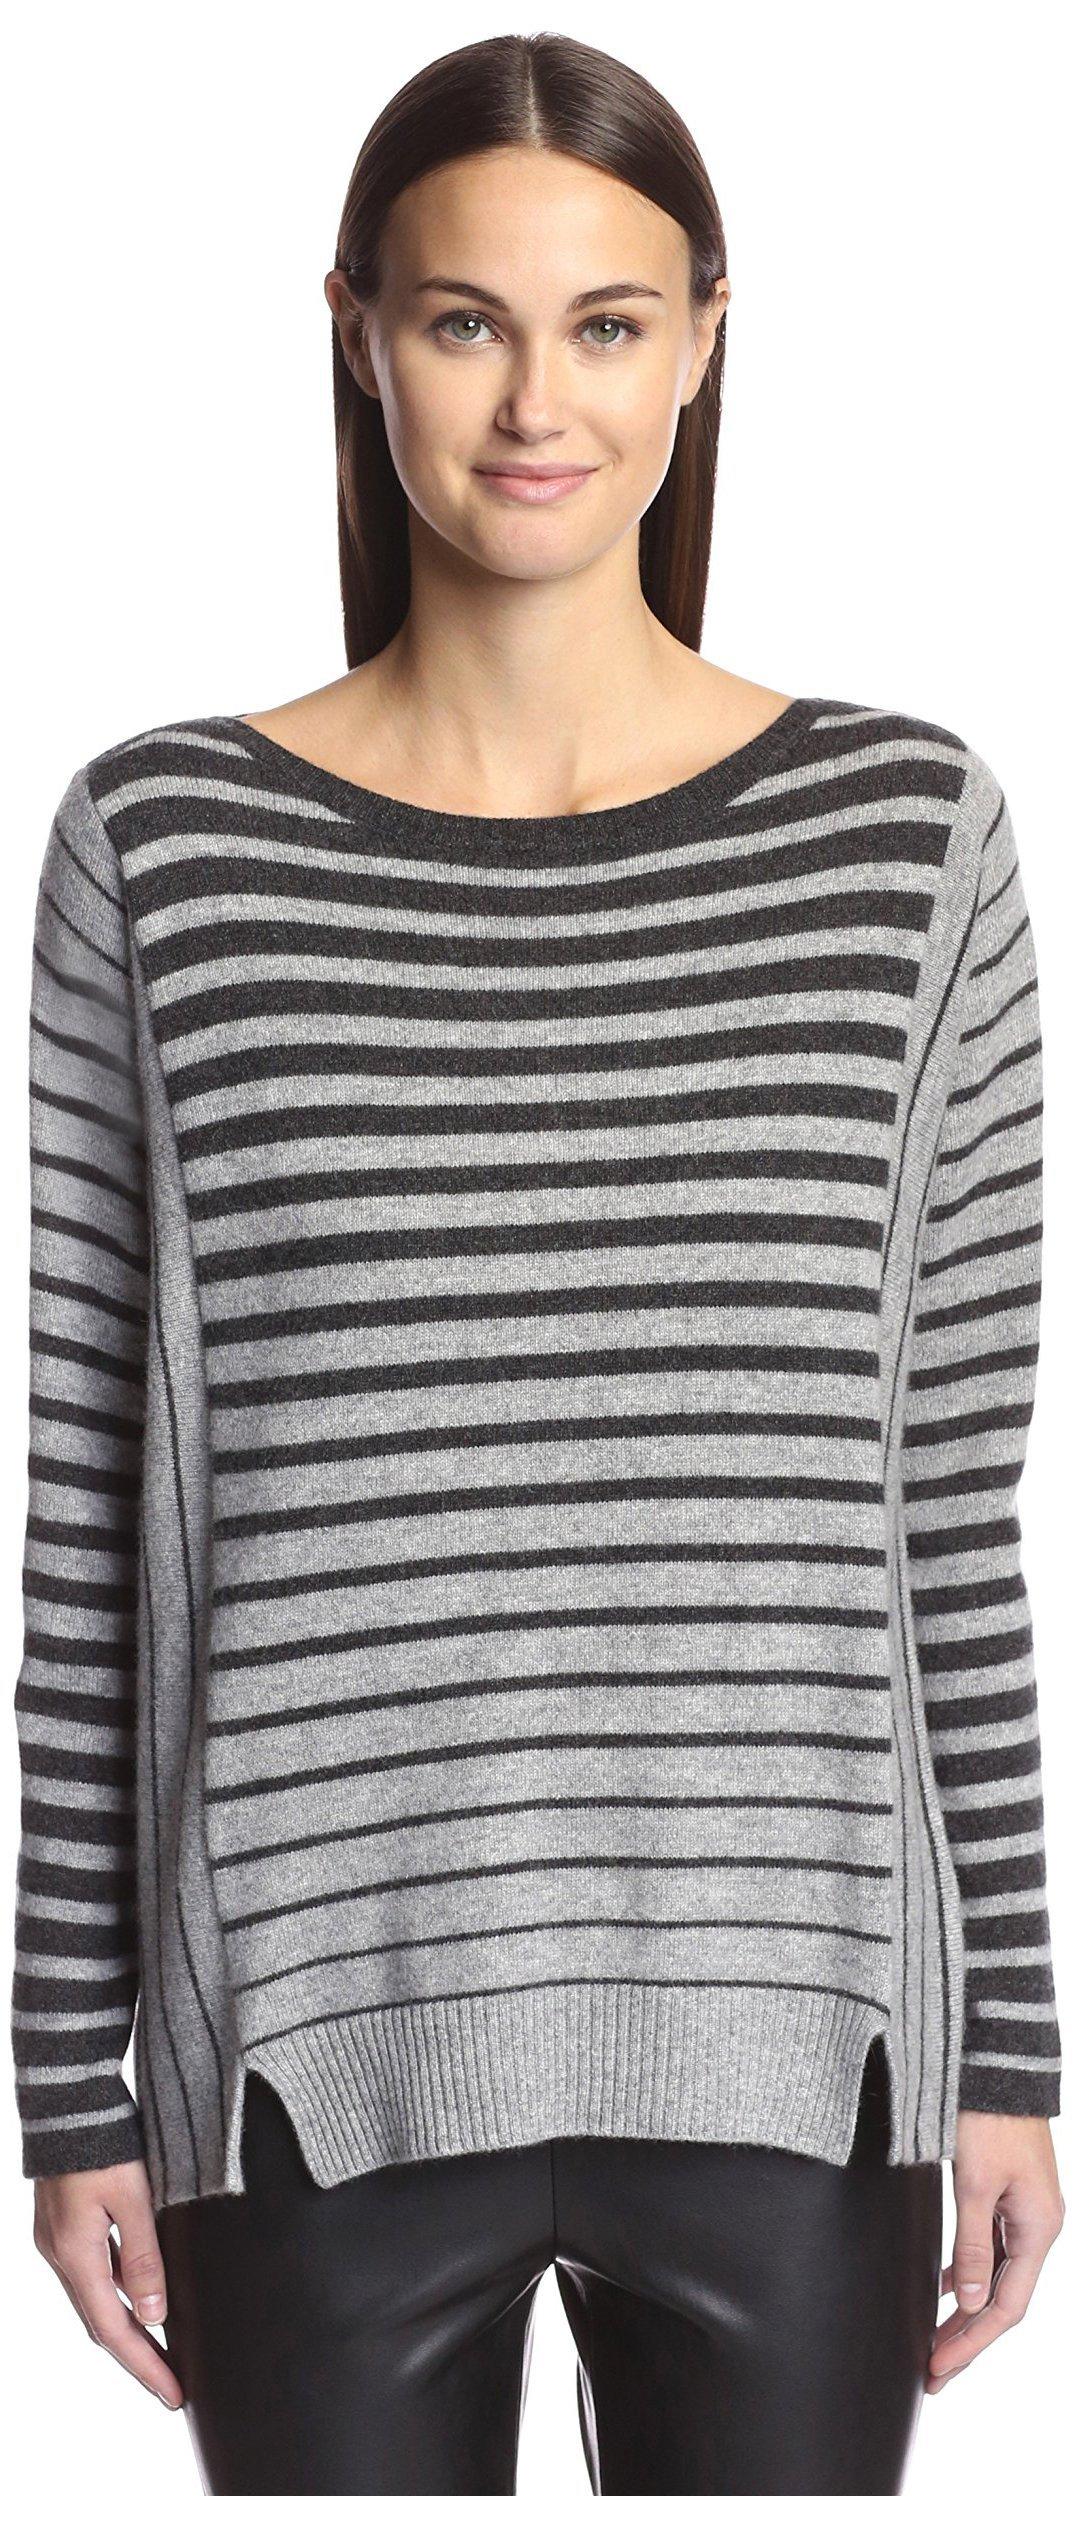 James & Erin Women's Cashmere Striped Boat Neck Sweater, Charcoal/Granite, L